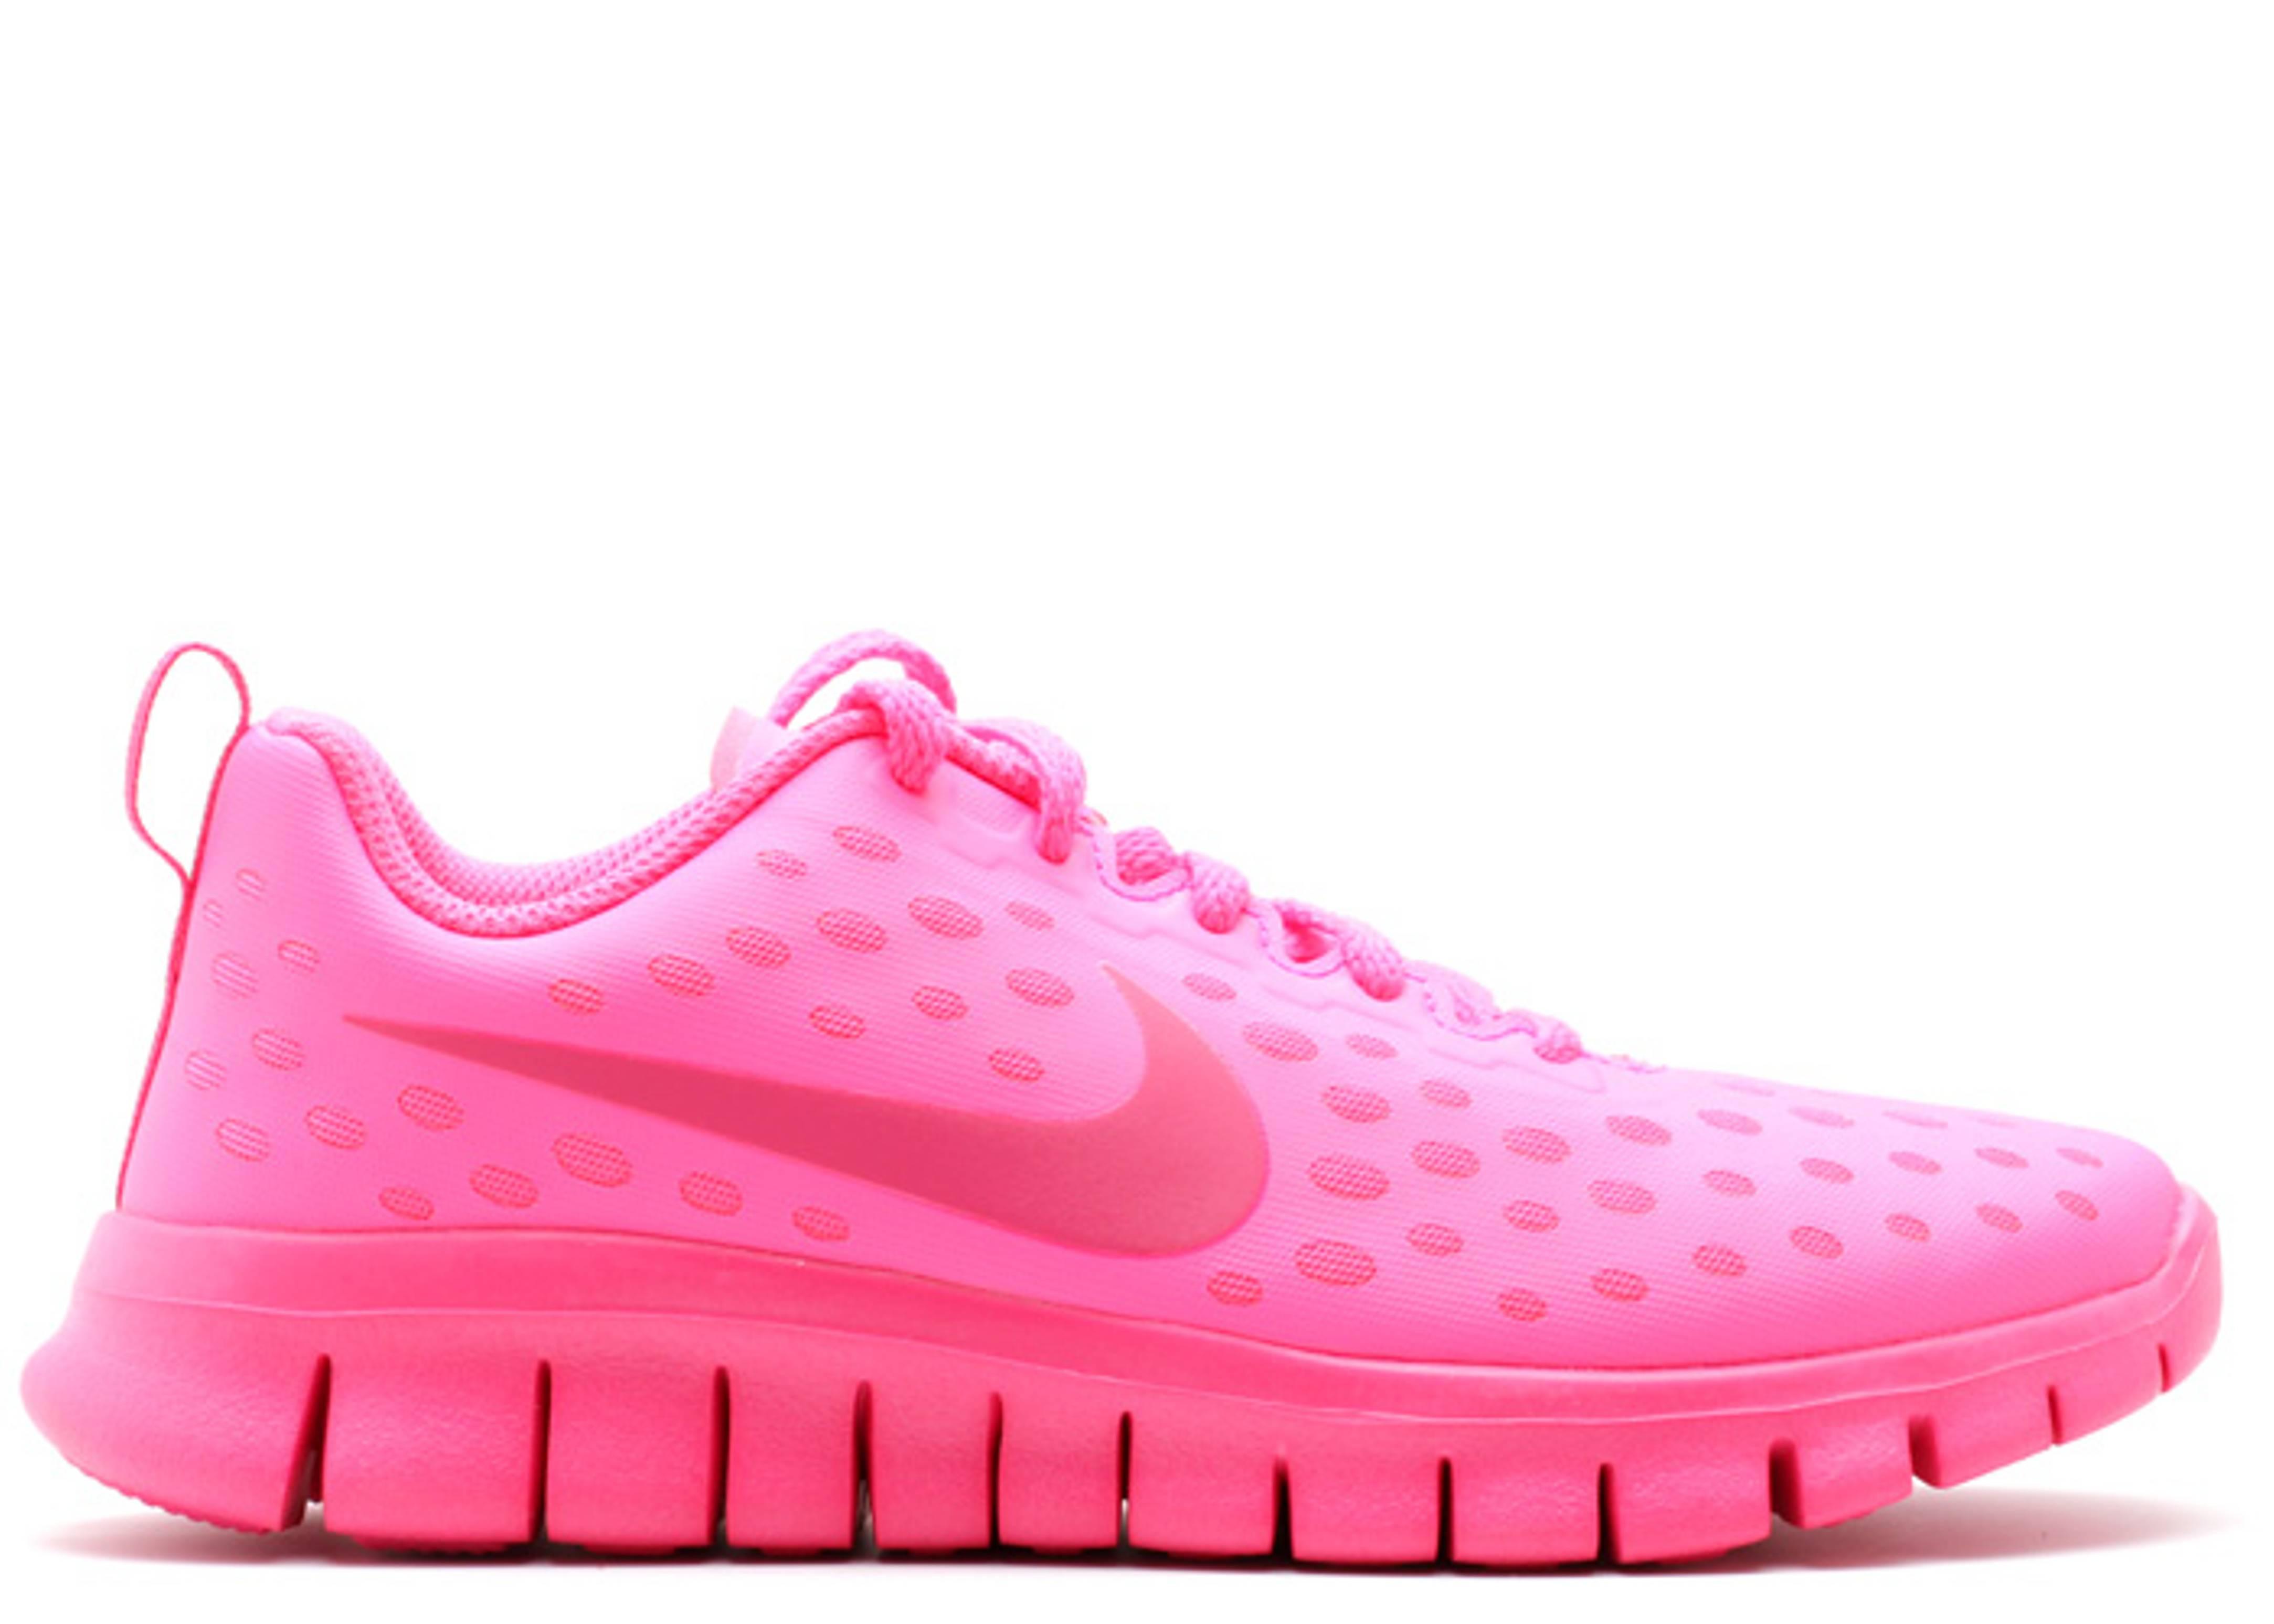 half off ae1a7 72793 Free Express (ps) - Nike - 641867 601 - hyper pink vivid pink   Flight Club